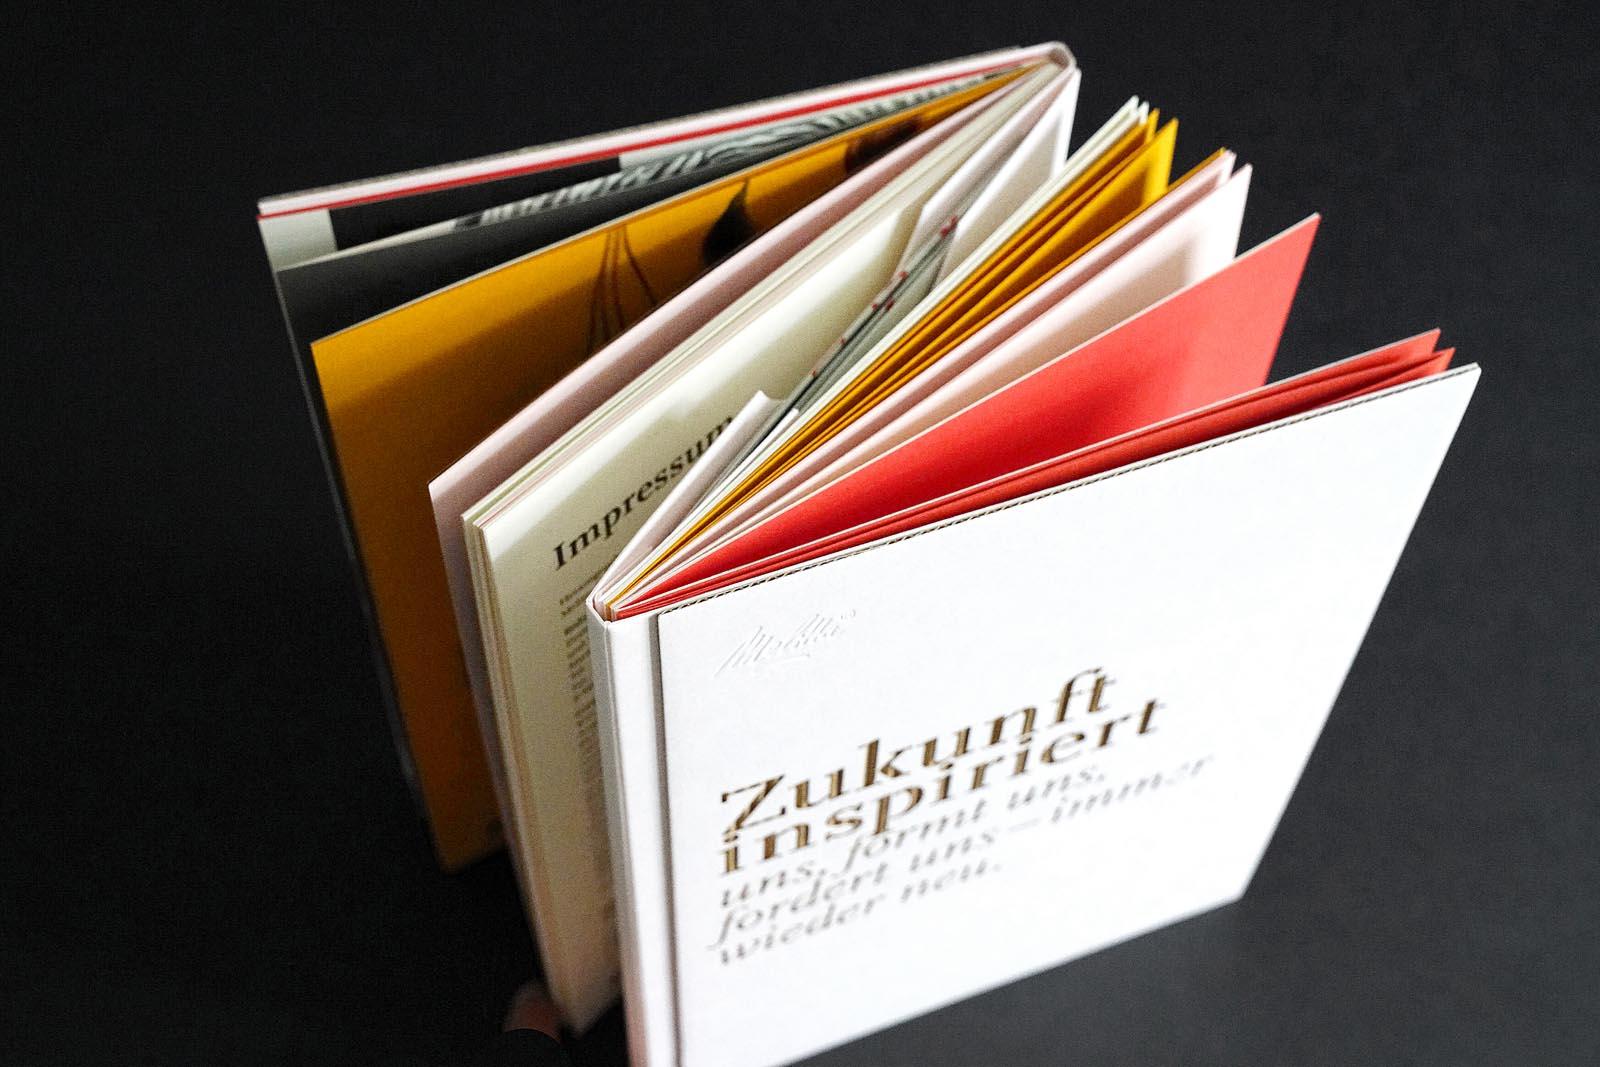 Der Melitta-Geschäftsbericht